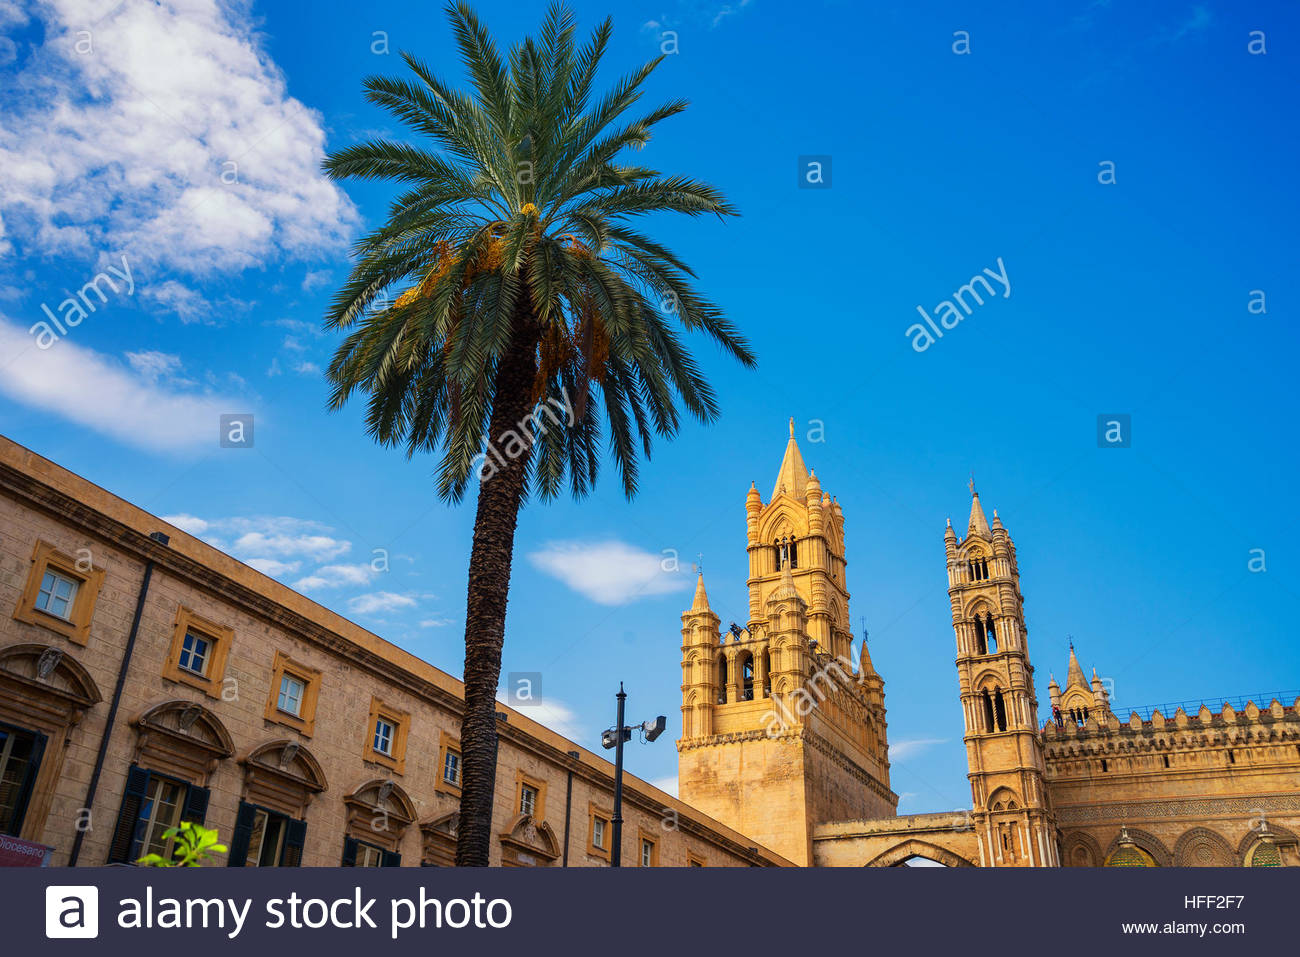 Kathedrale von Palermo, Palermo, Sizilien, Italien, Europa, Stockbild